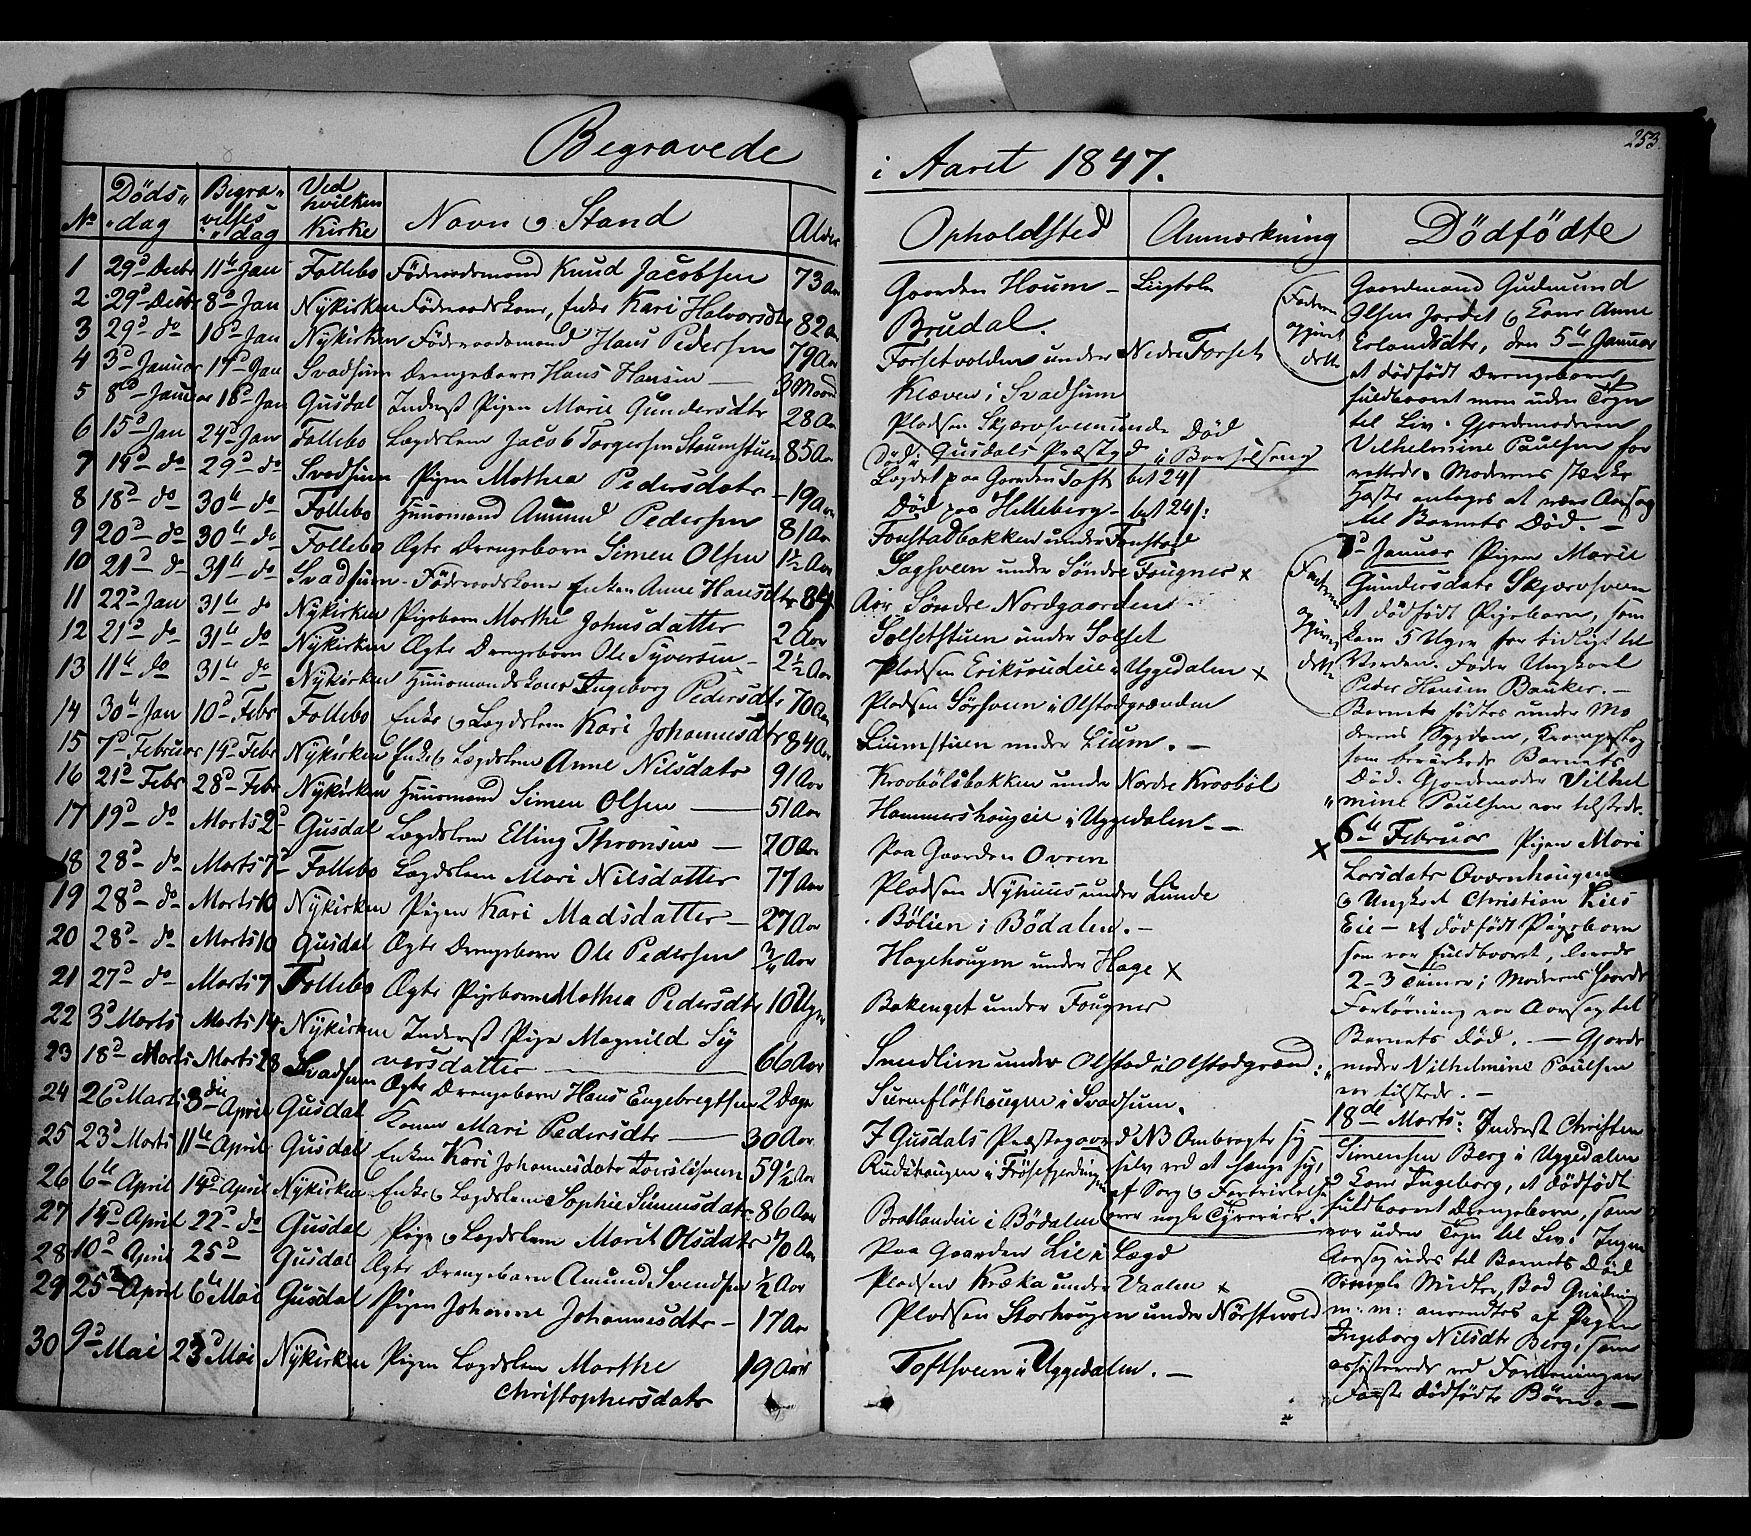 SAH, Gausdal prestekontor, Ministerialbok nr. 7, 1840-1850, s. 253